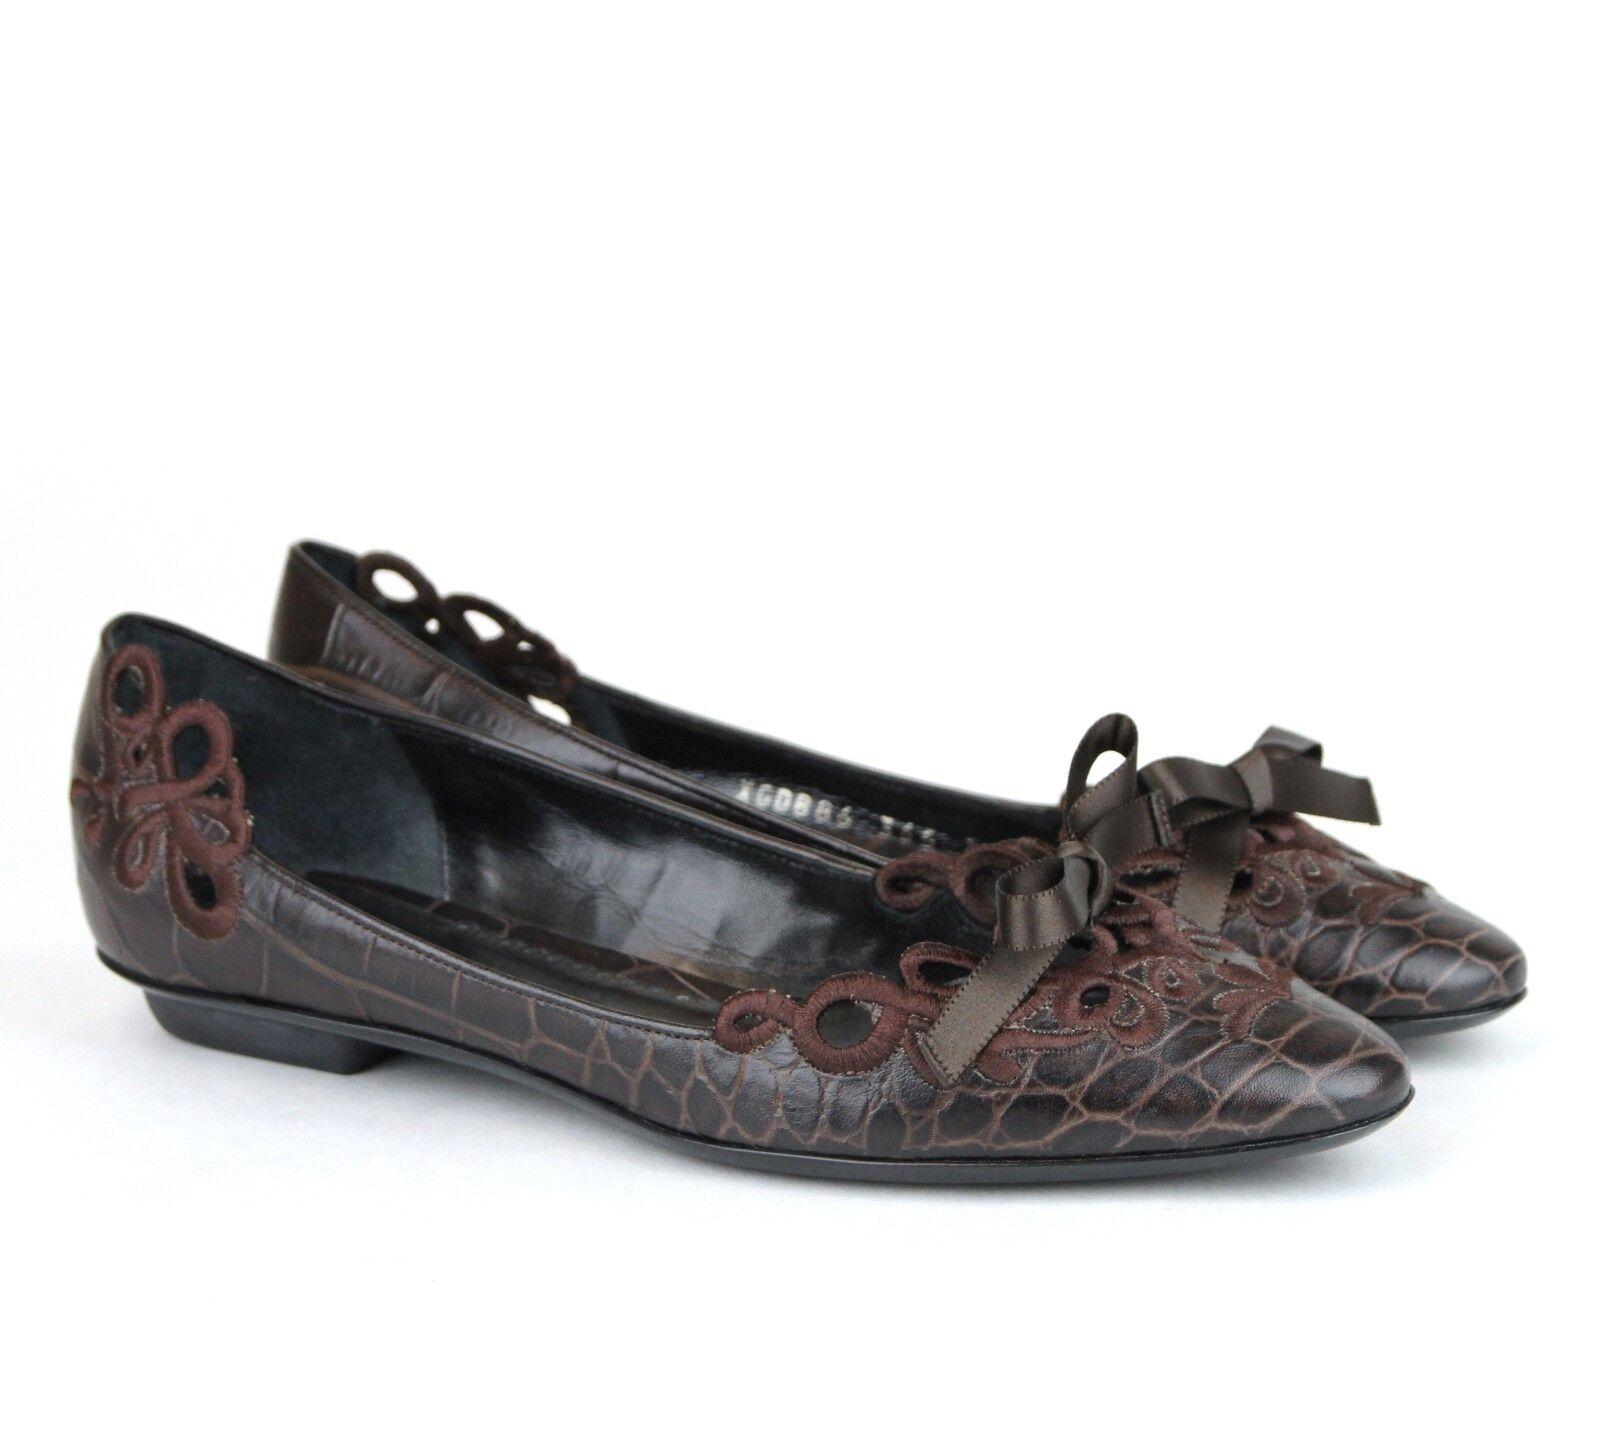 550 New Authentic GIORGIO ARMANI Pelle Flats Crocodile Crocodile Flats Imprint marrone XGDB86 6ddc59